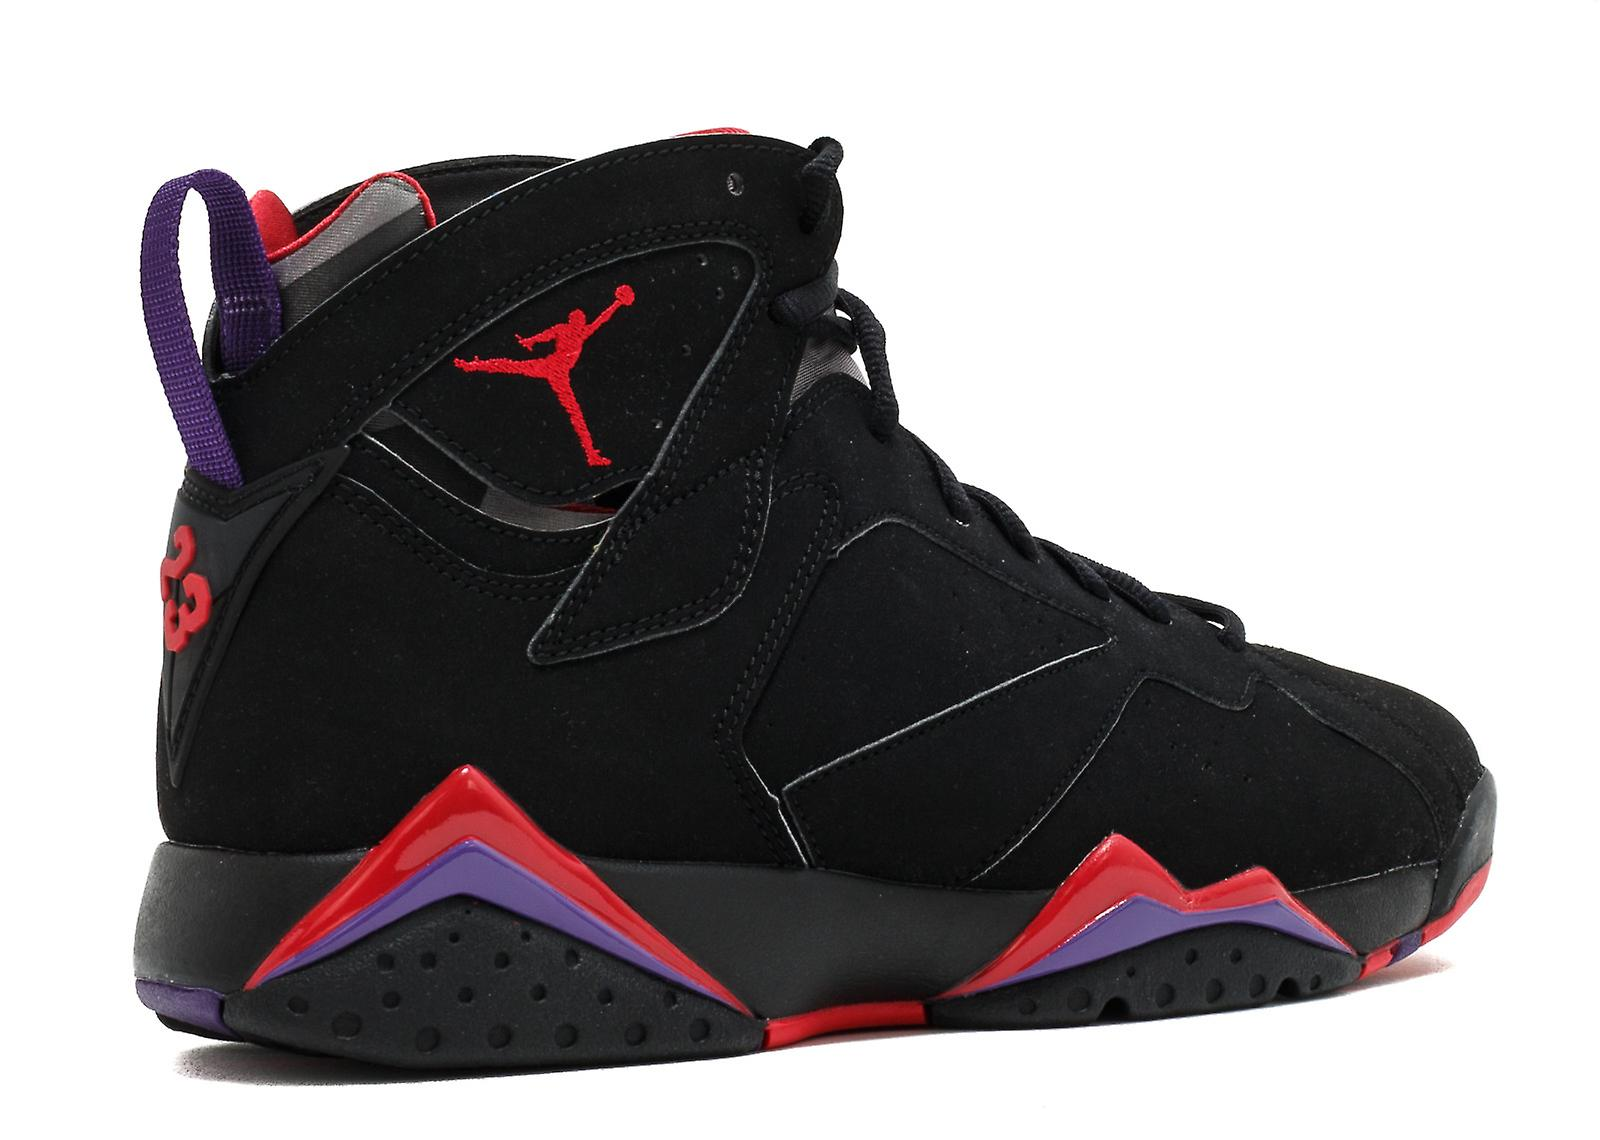 Air Jordan 7 Retro ??Raptor?? - 304775 304775 304775 - 018 - chaussures 6609e7